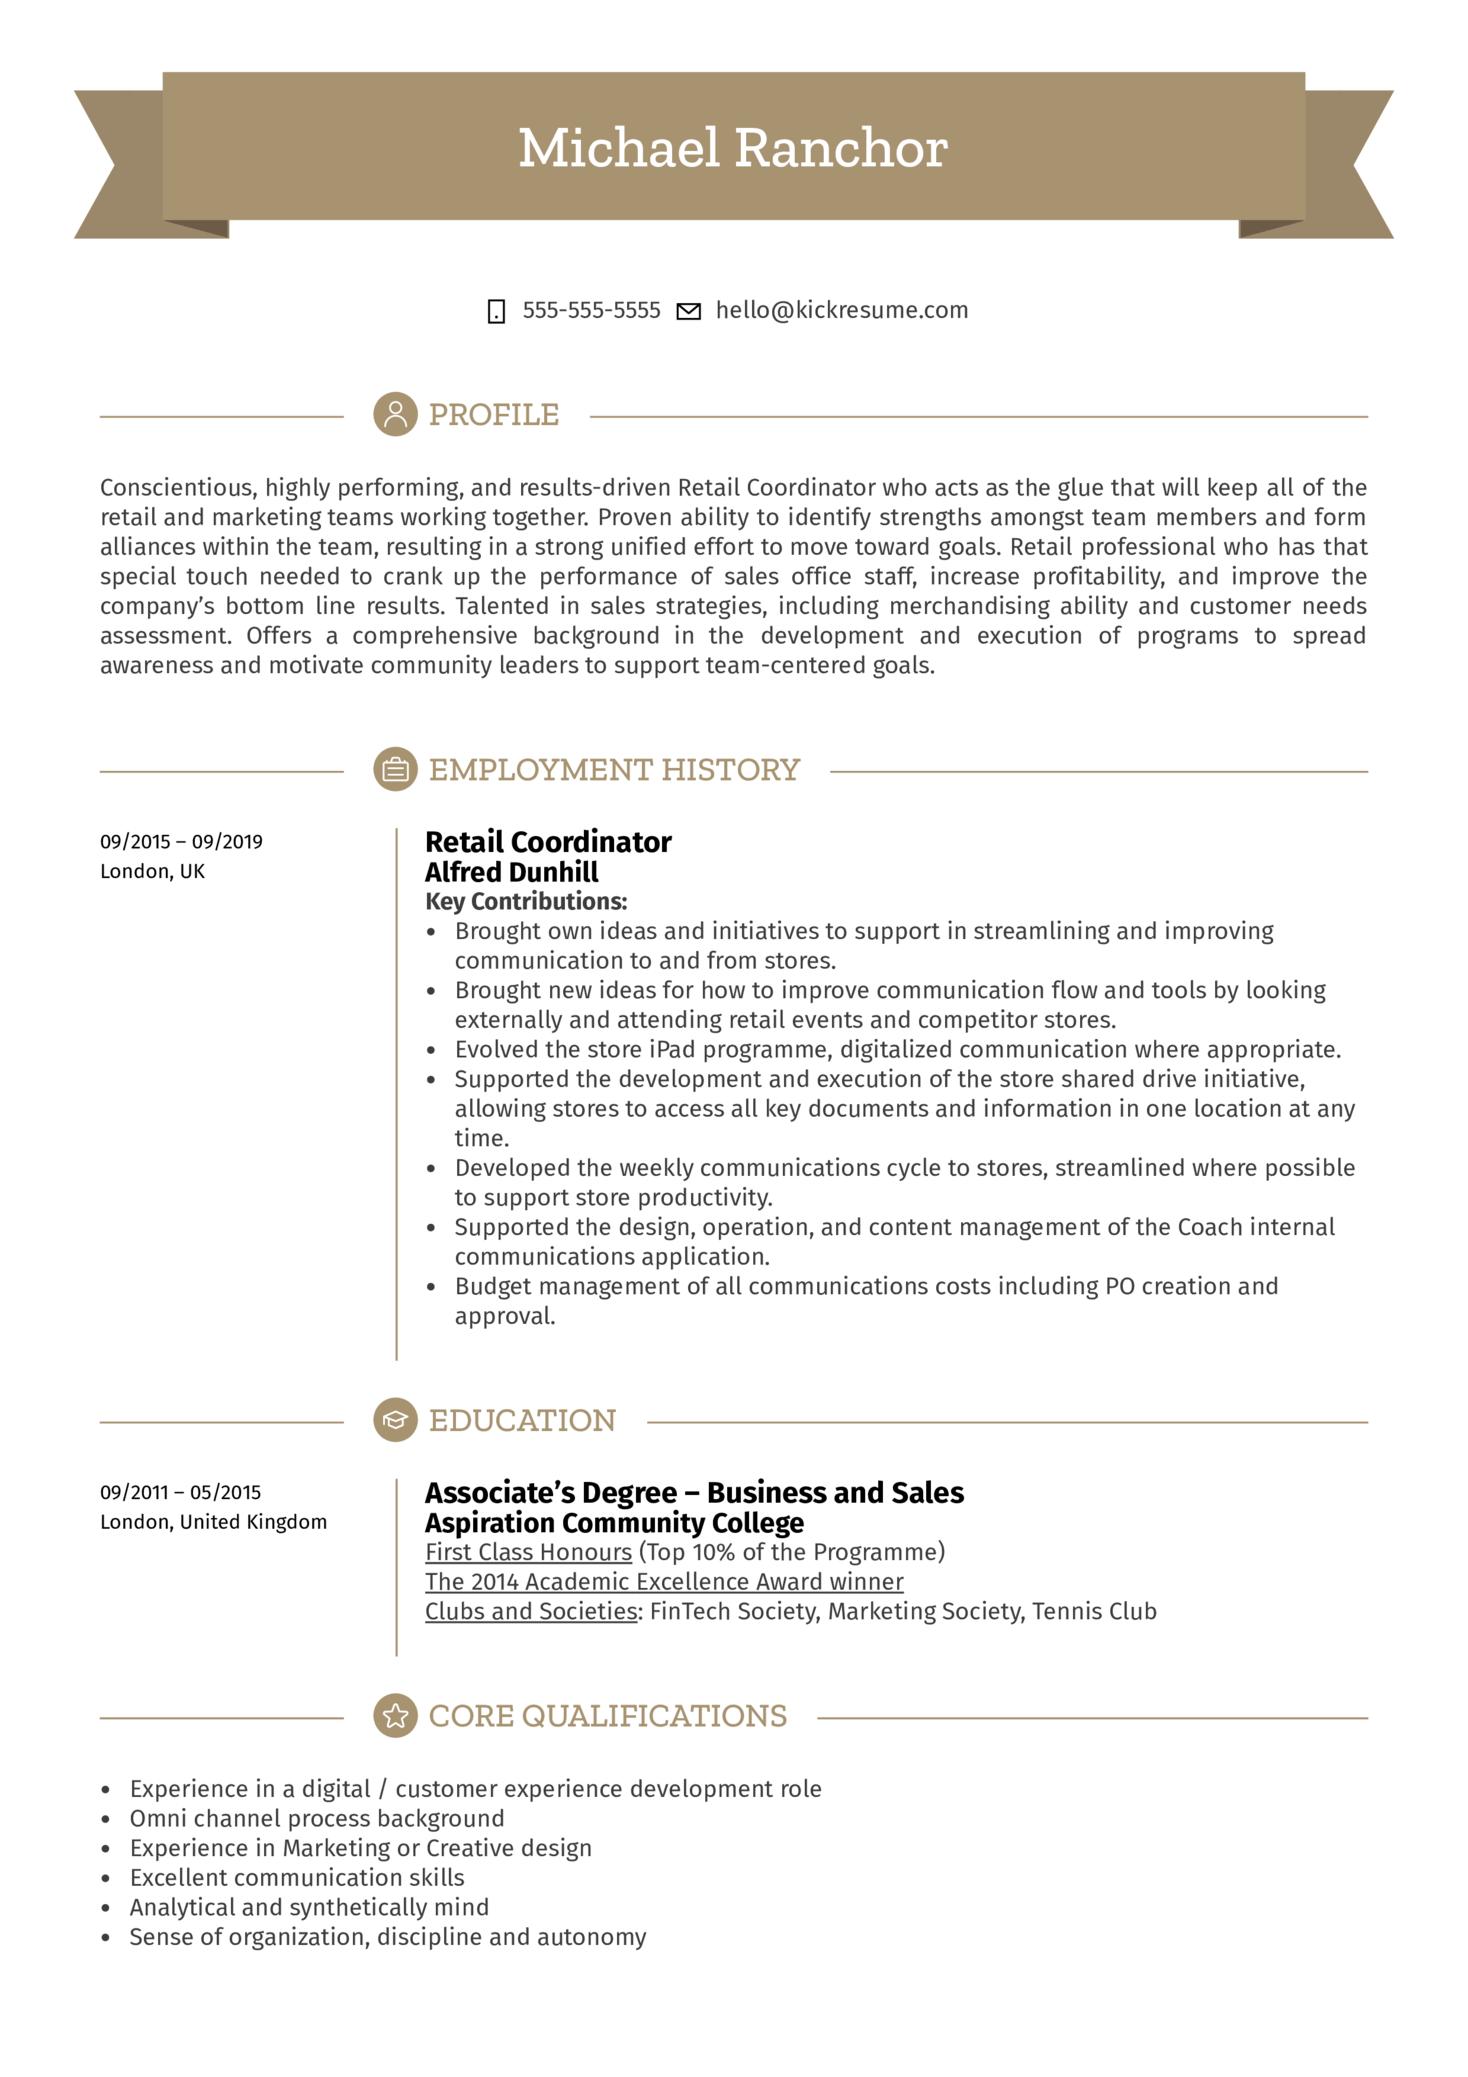 Retail Coordinator Resume Sample (parte 1)